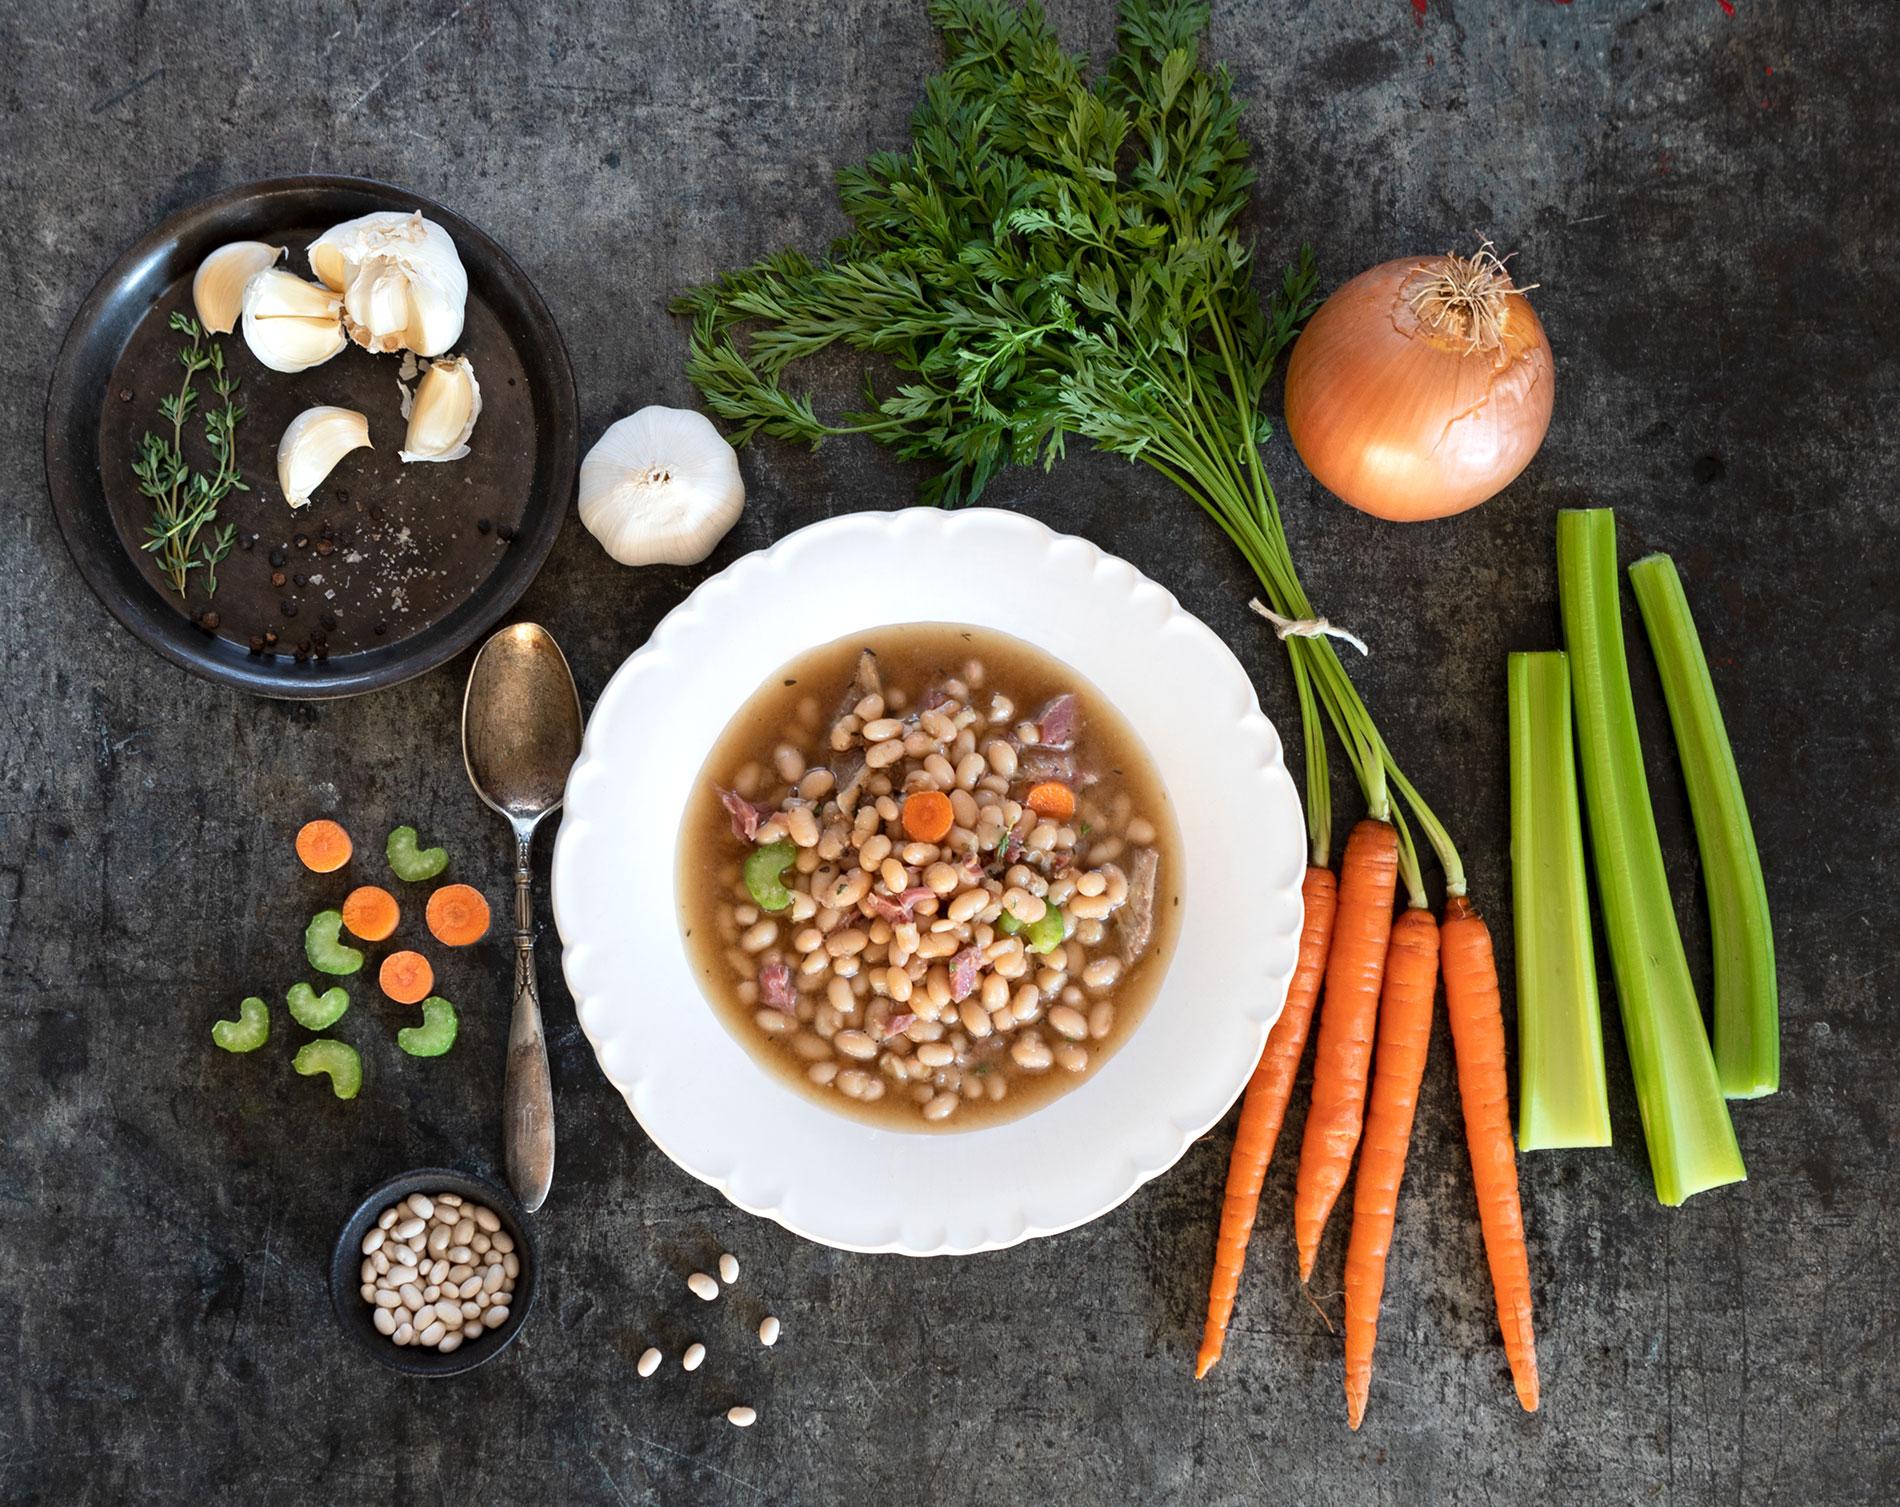 North Carolina Cassoulet (Navy Beans & Meats in Ham Hock Stock)